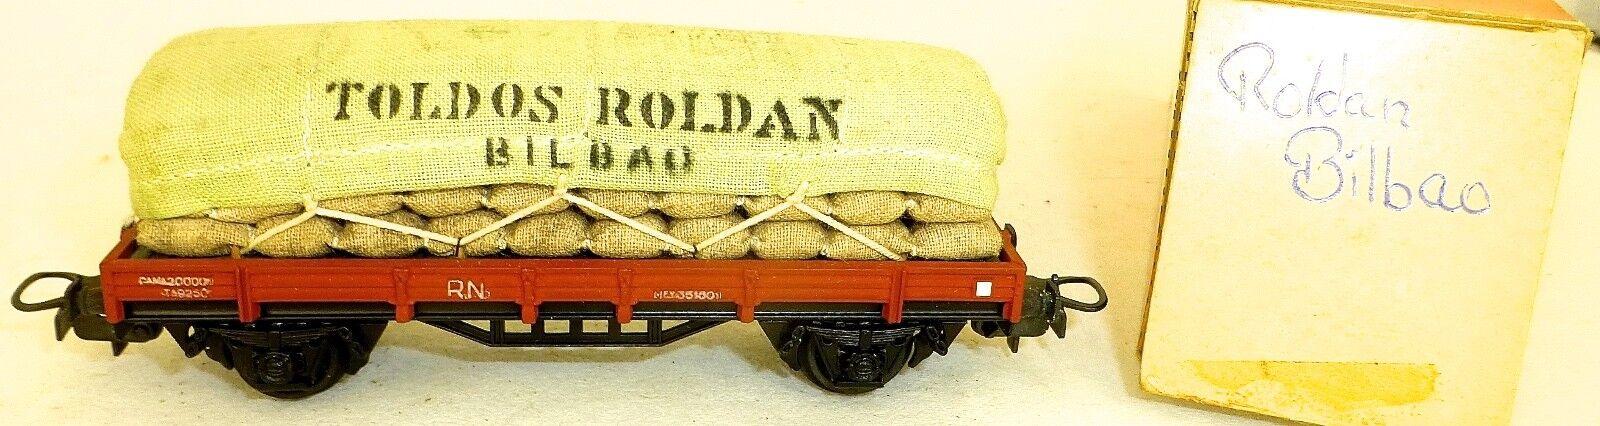 RN Toldos Roldan Bilbao offener Güterwagen Electrotren H0 1 87 å    Vielfalt